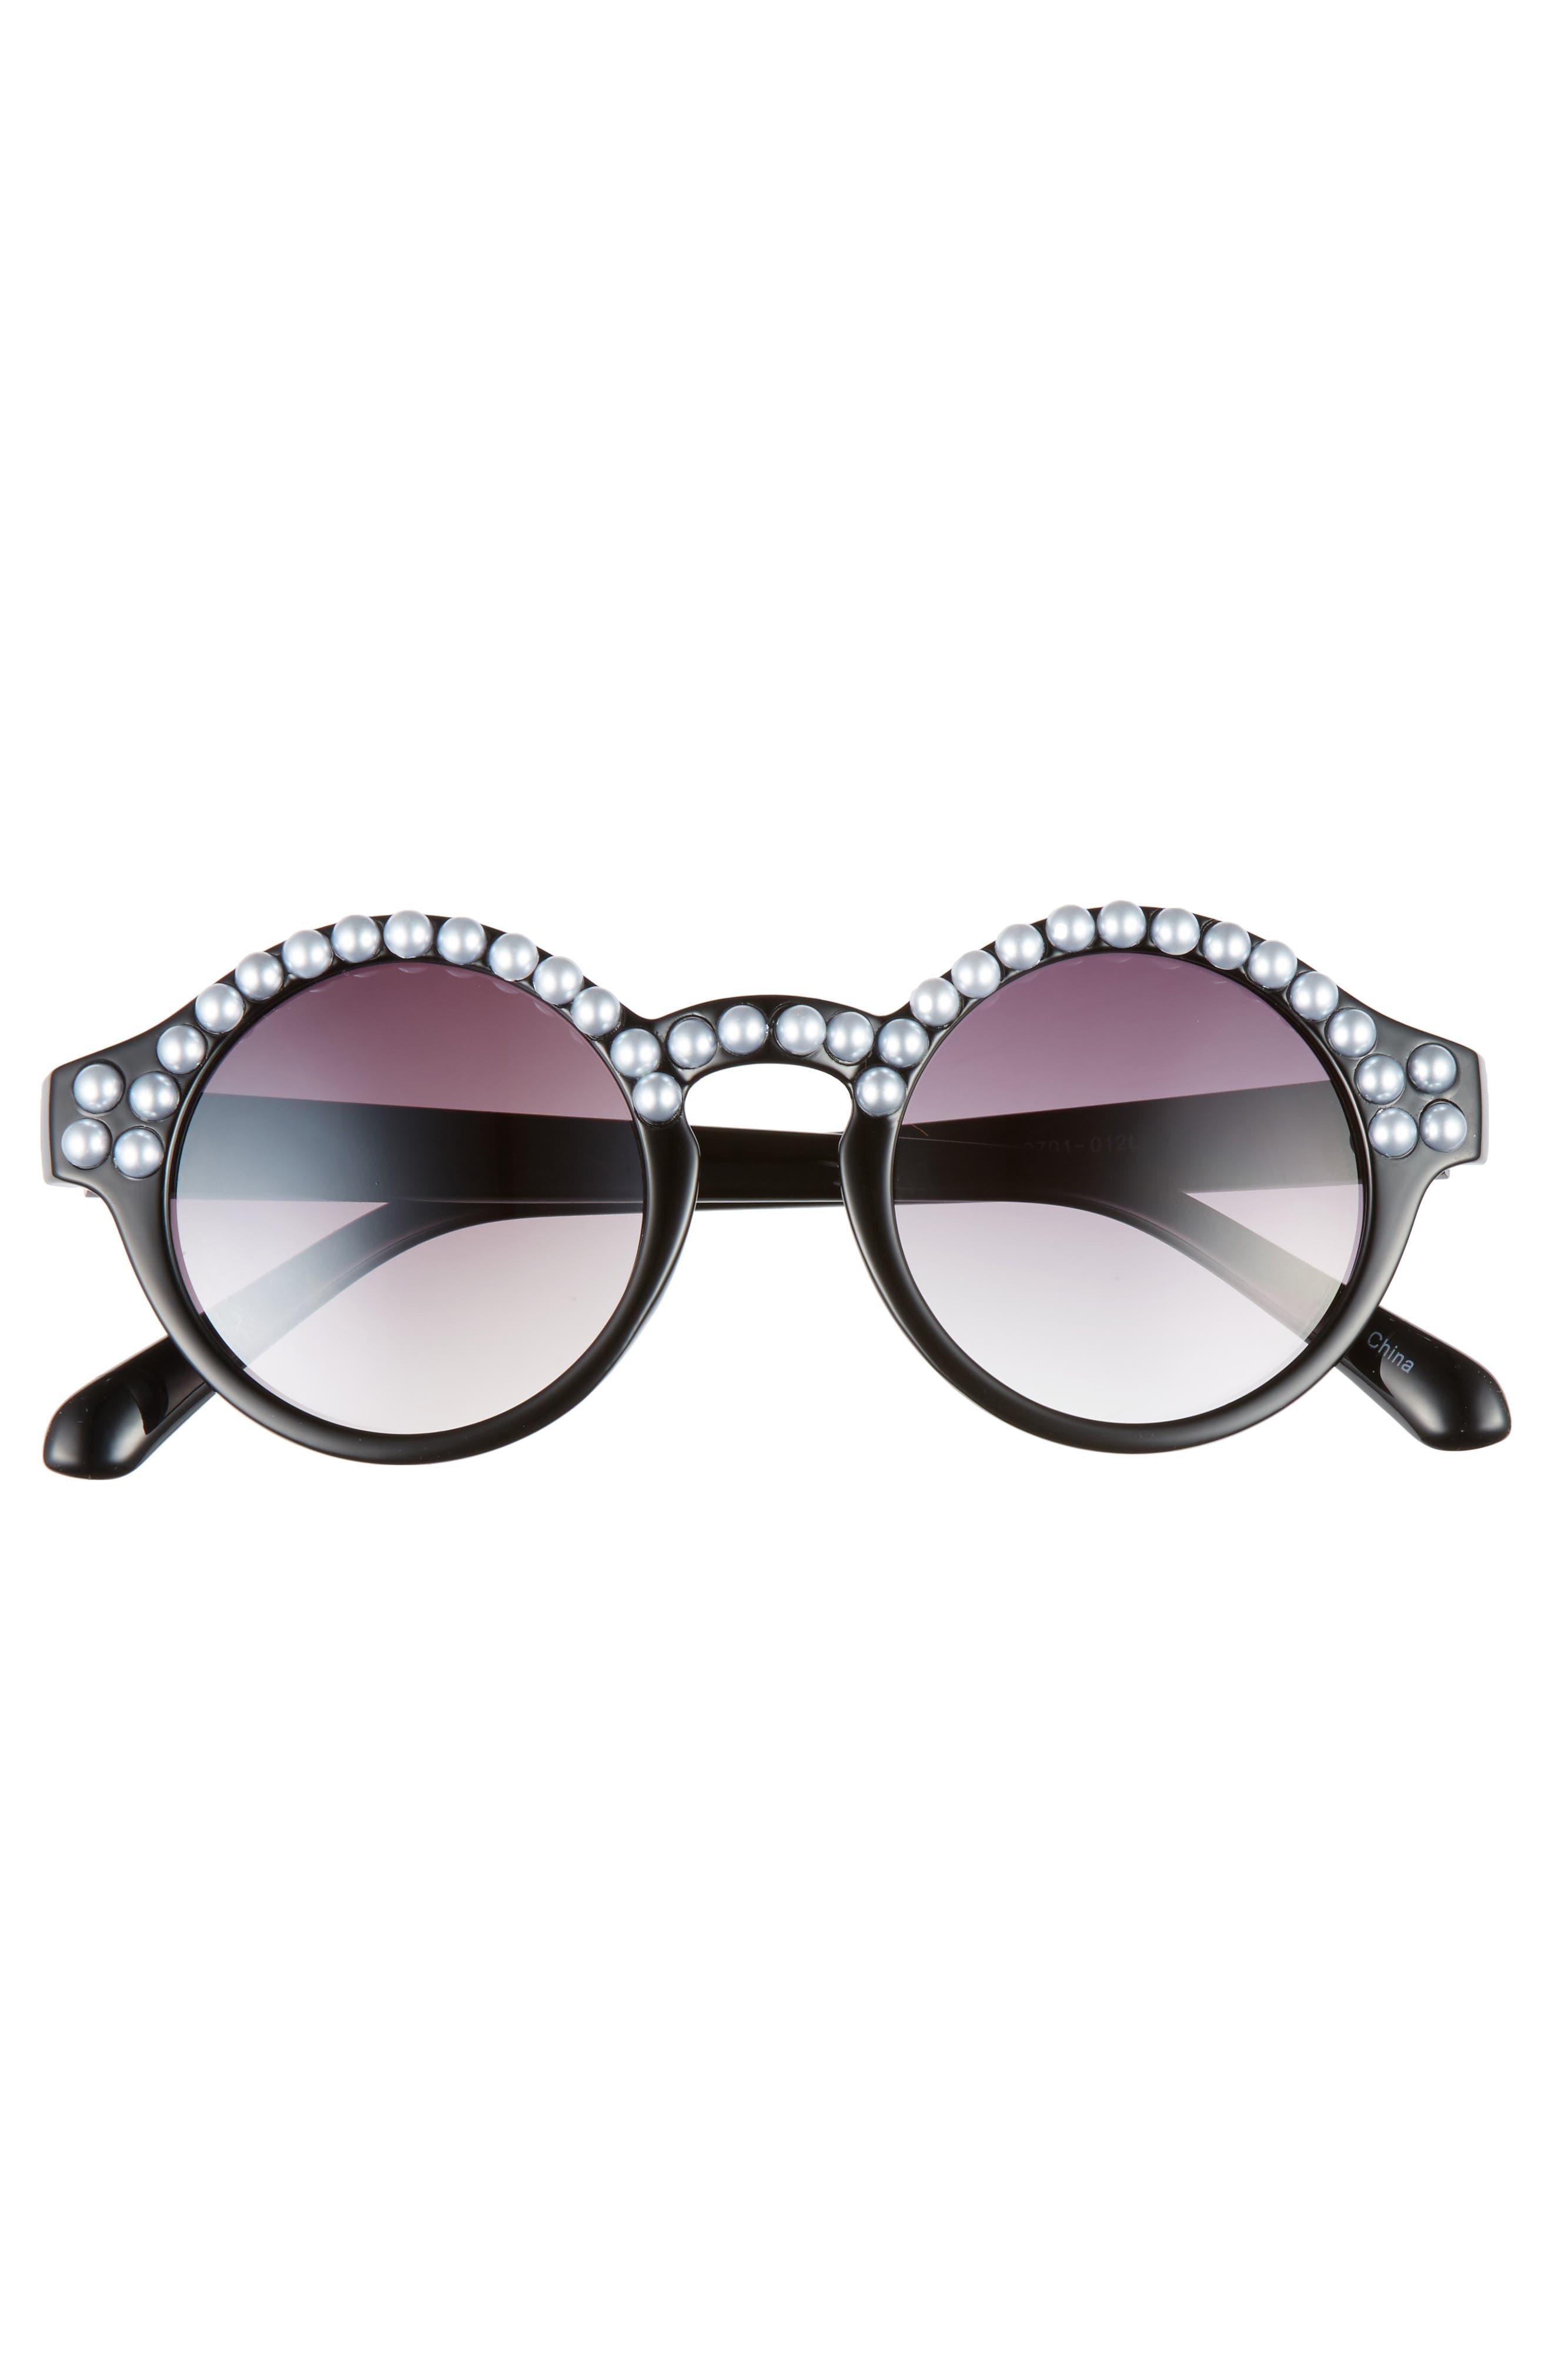 45mm Imitation Pearl Round Sunglasses,                             Alternate thumbnail 3, color,                             002